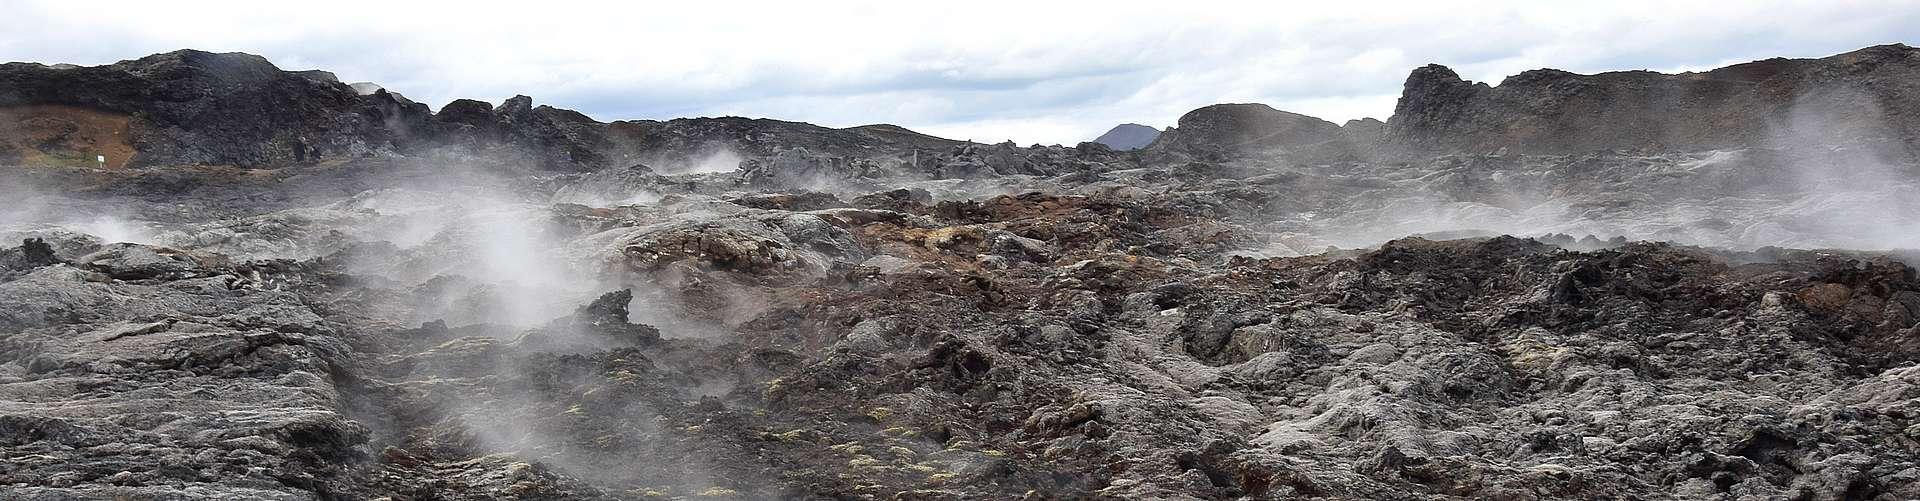 Coulée lave Krafla Islande